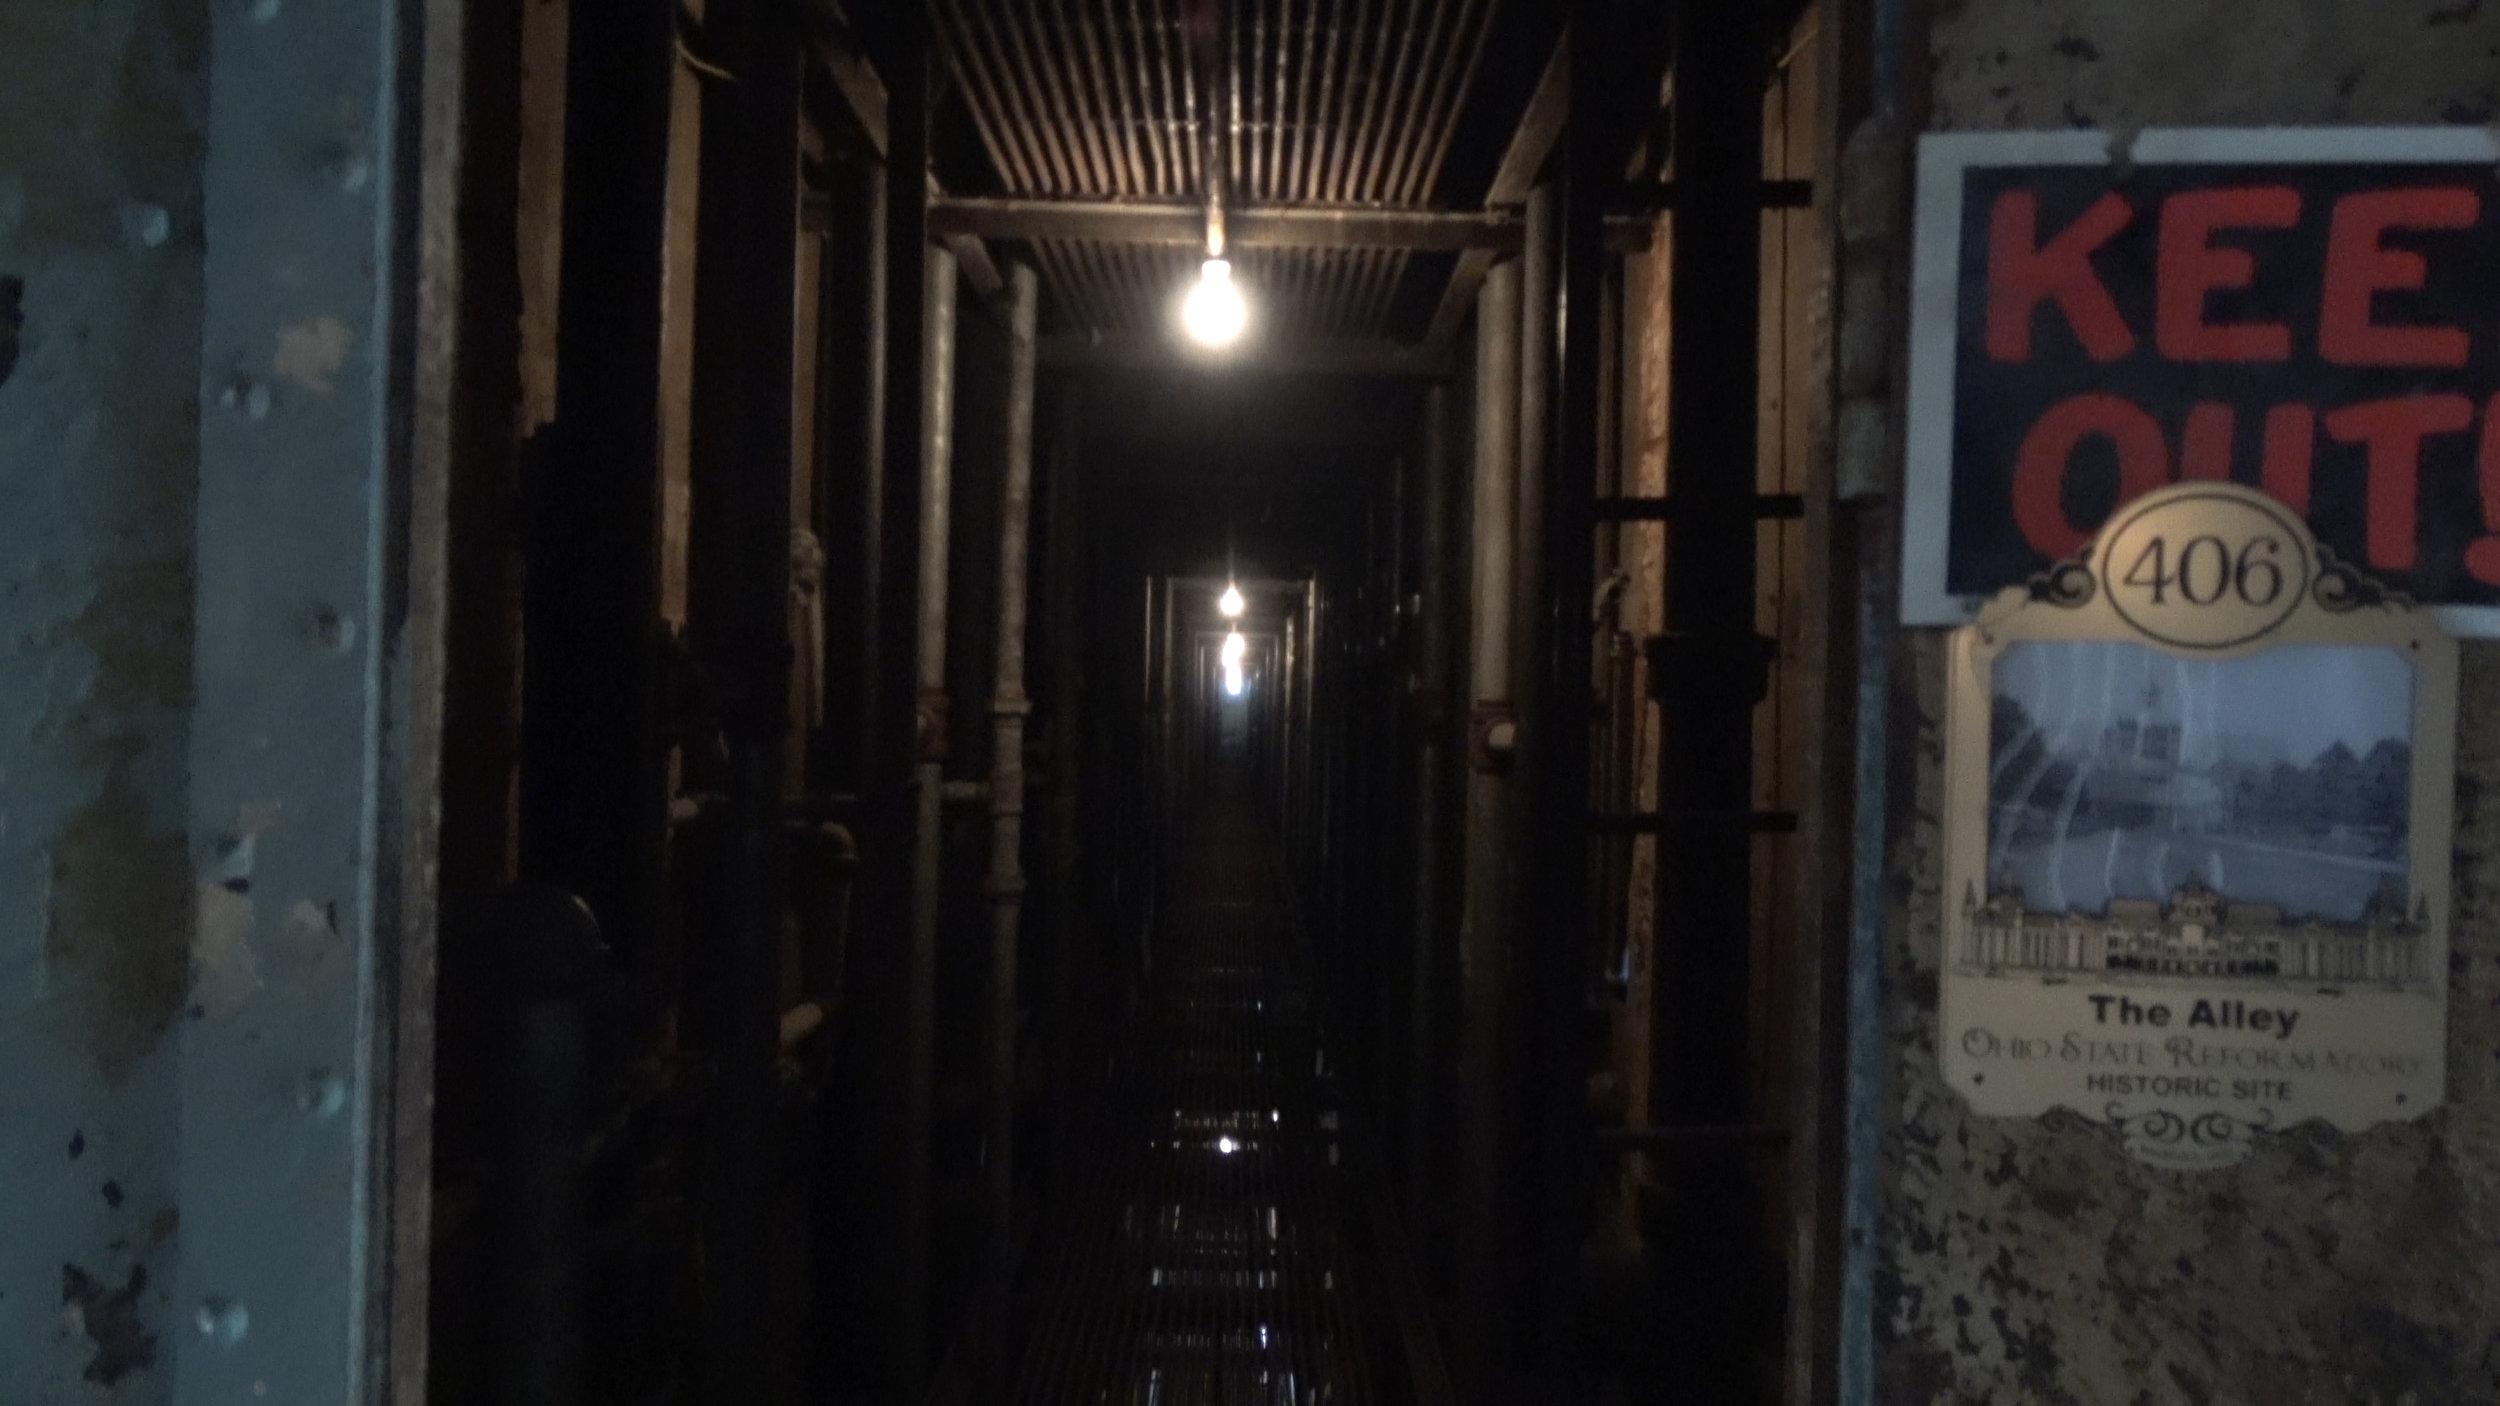 Creepy off-limits hallway